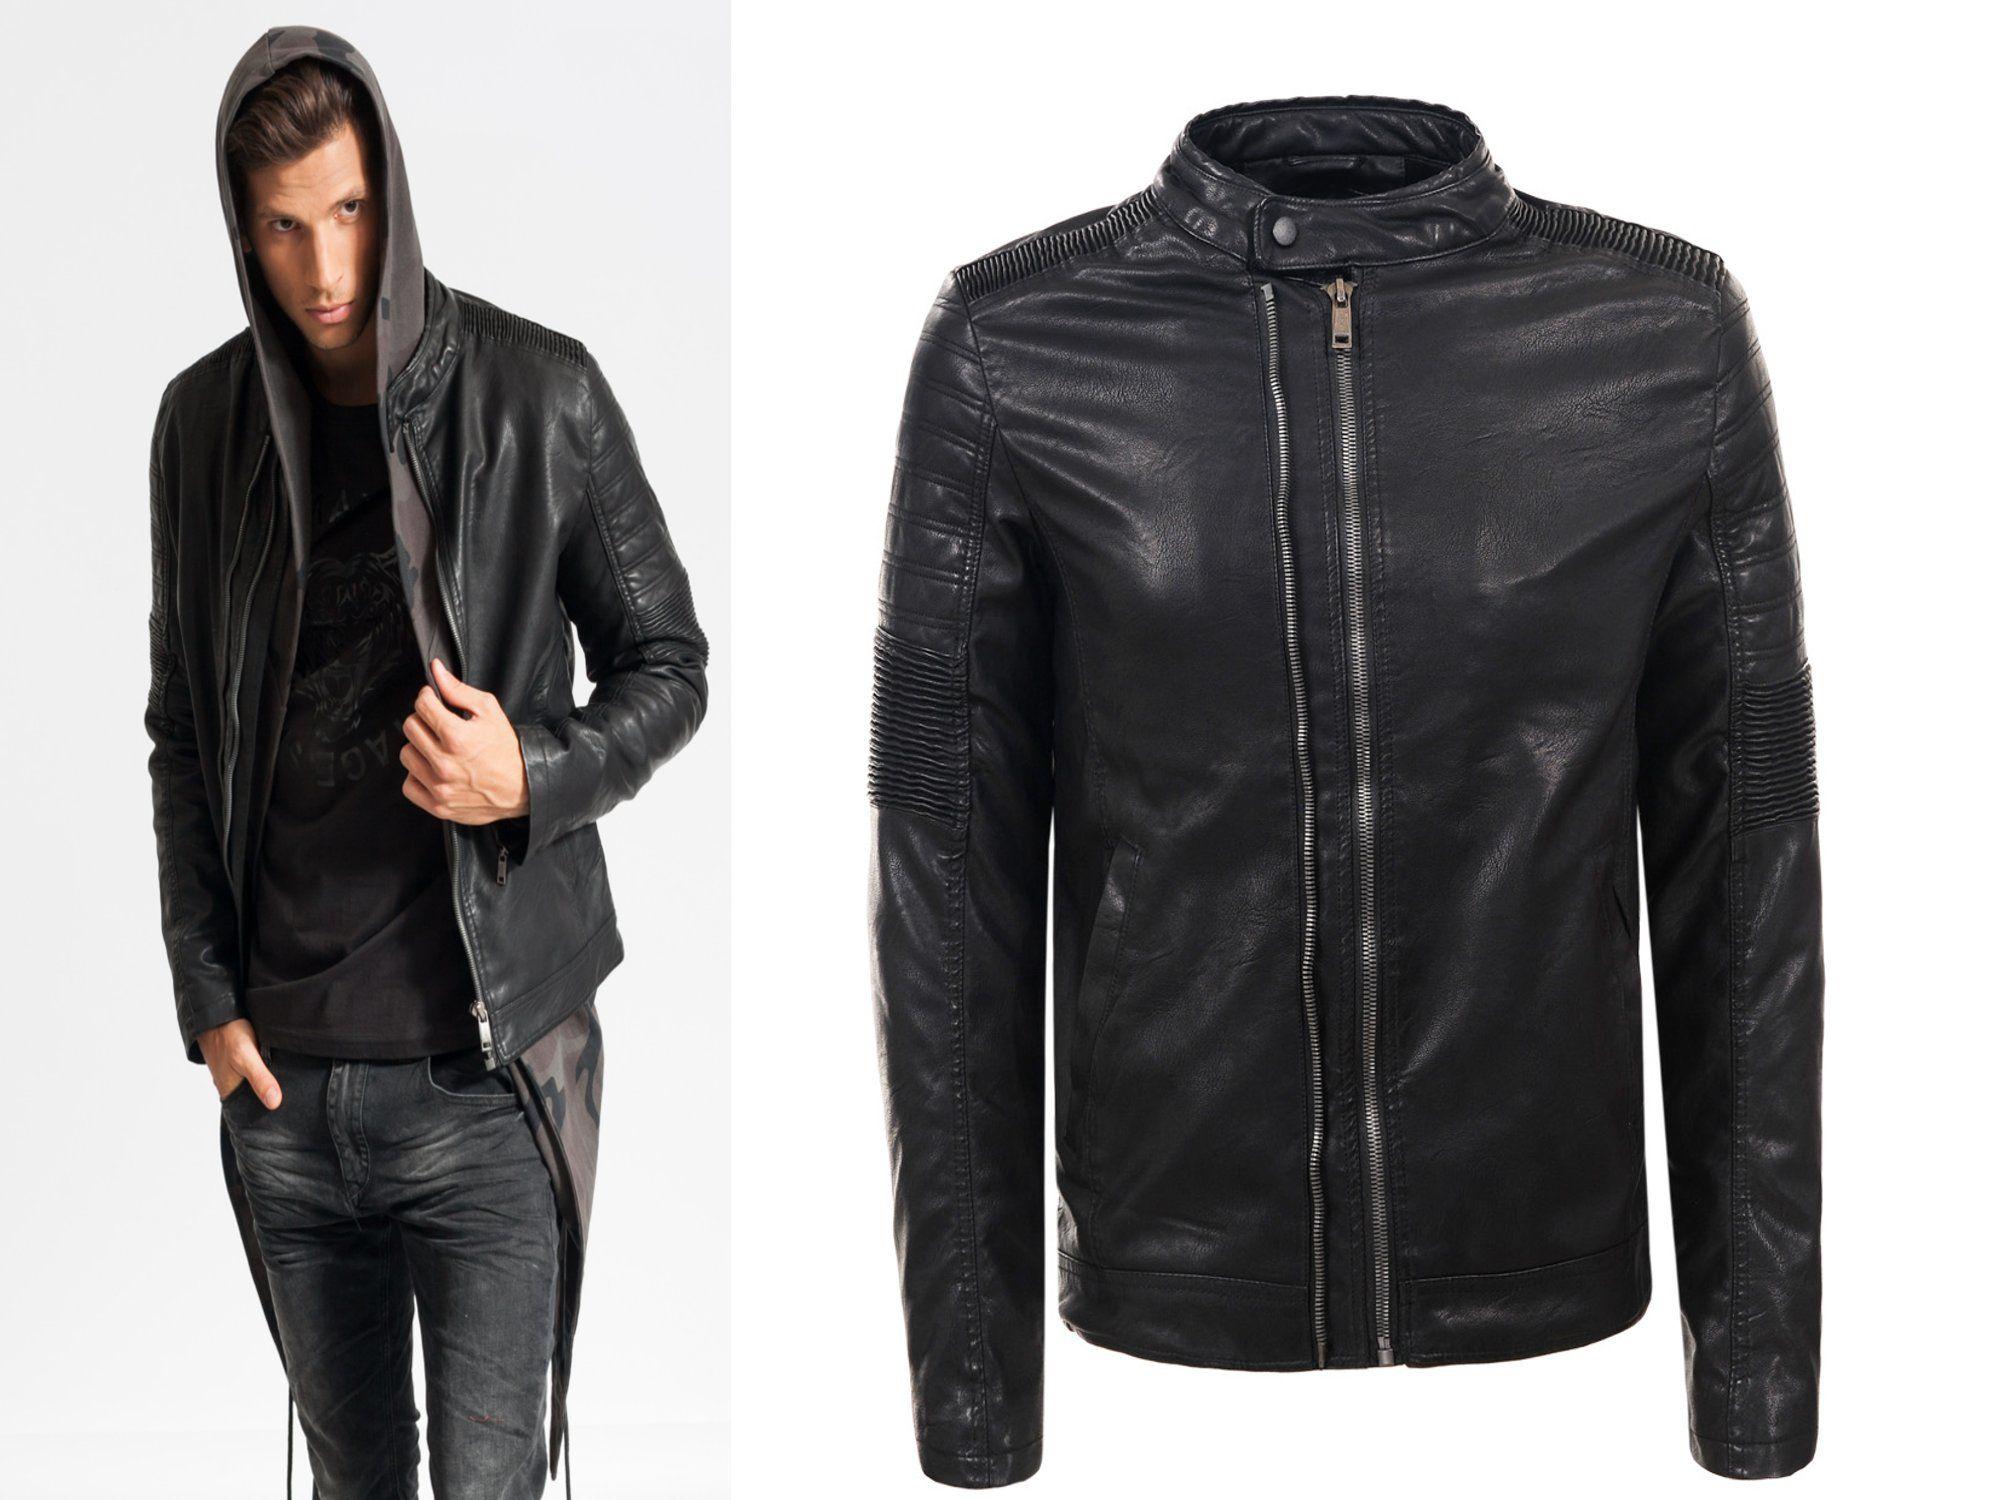 Skora Meska Kurtka Skorzana Eko Ocieplana M 6976042386 Oficjalne Archiwum Allegro Leather Jacket Fashion Jackets